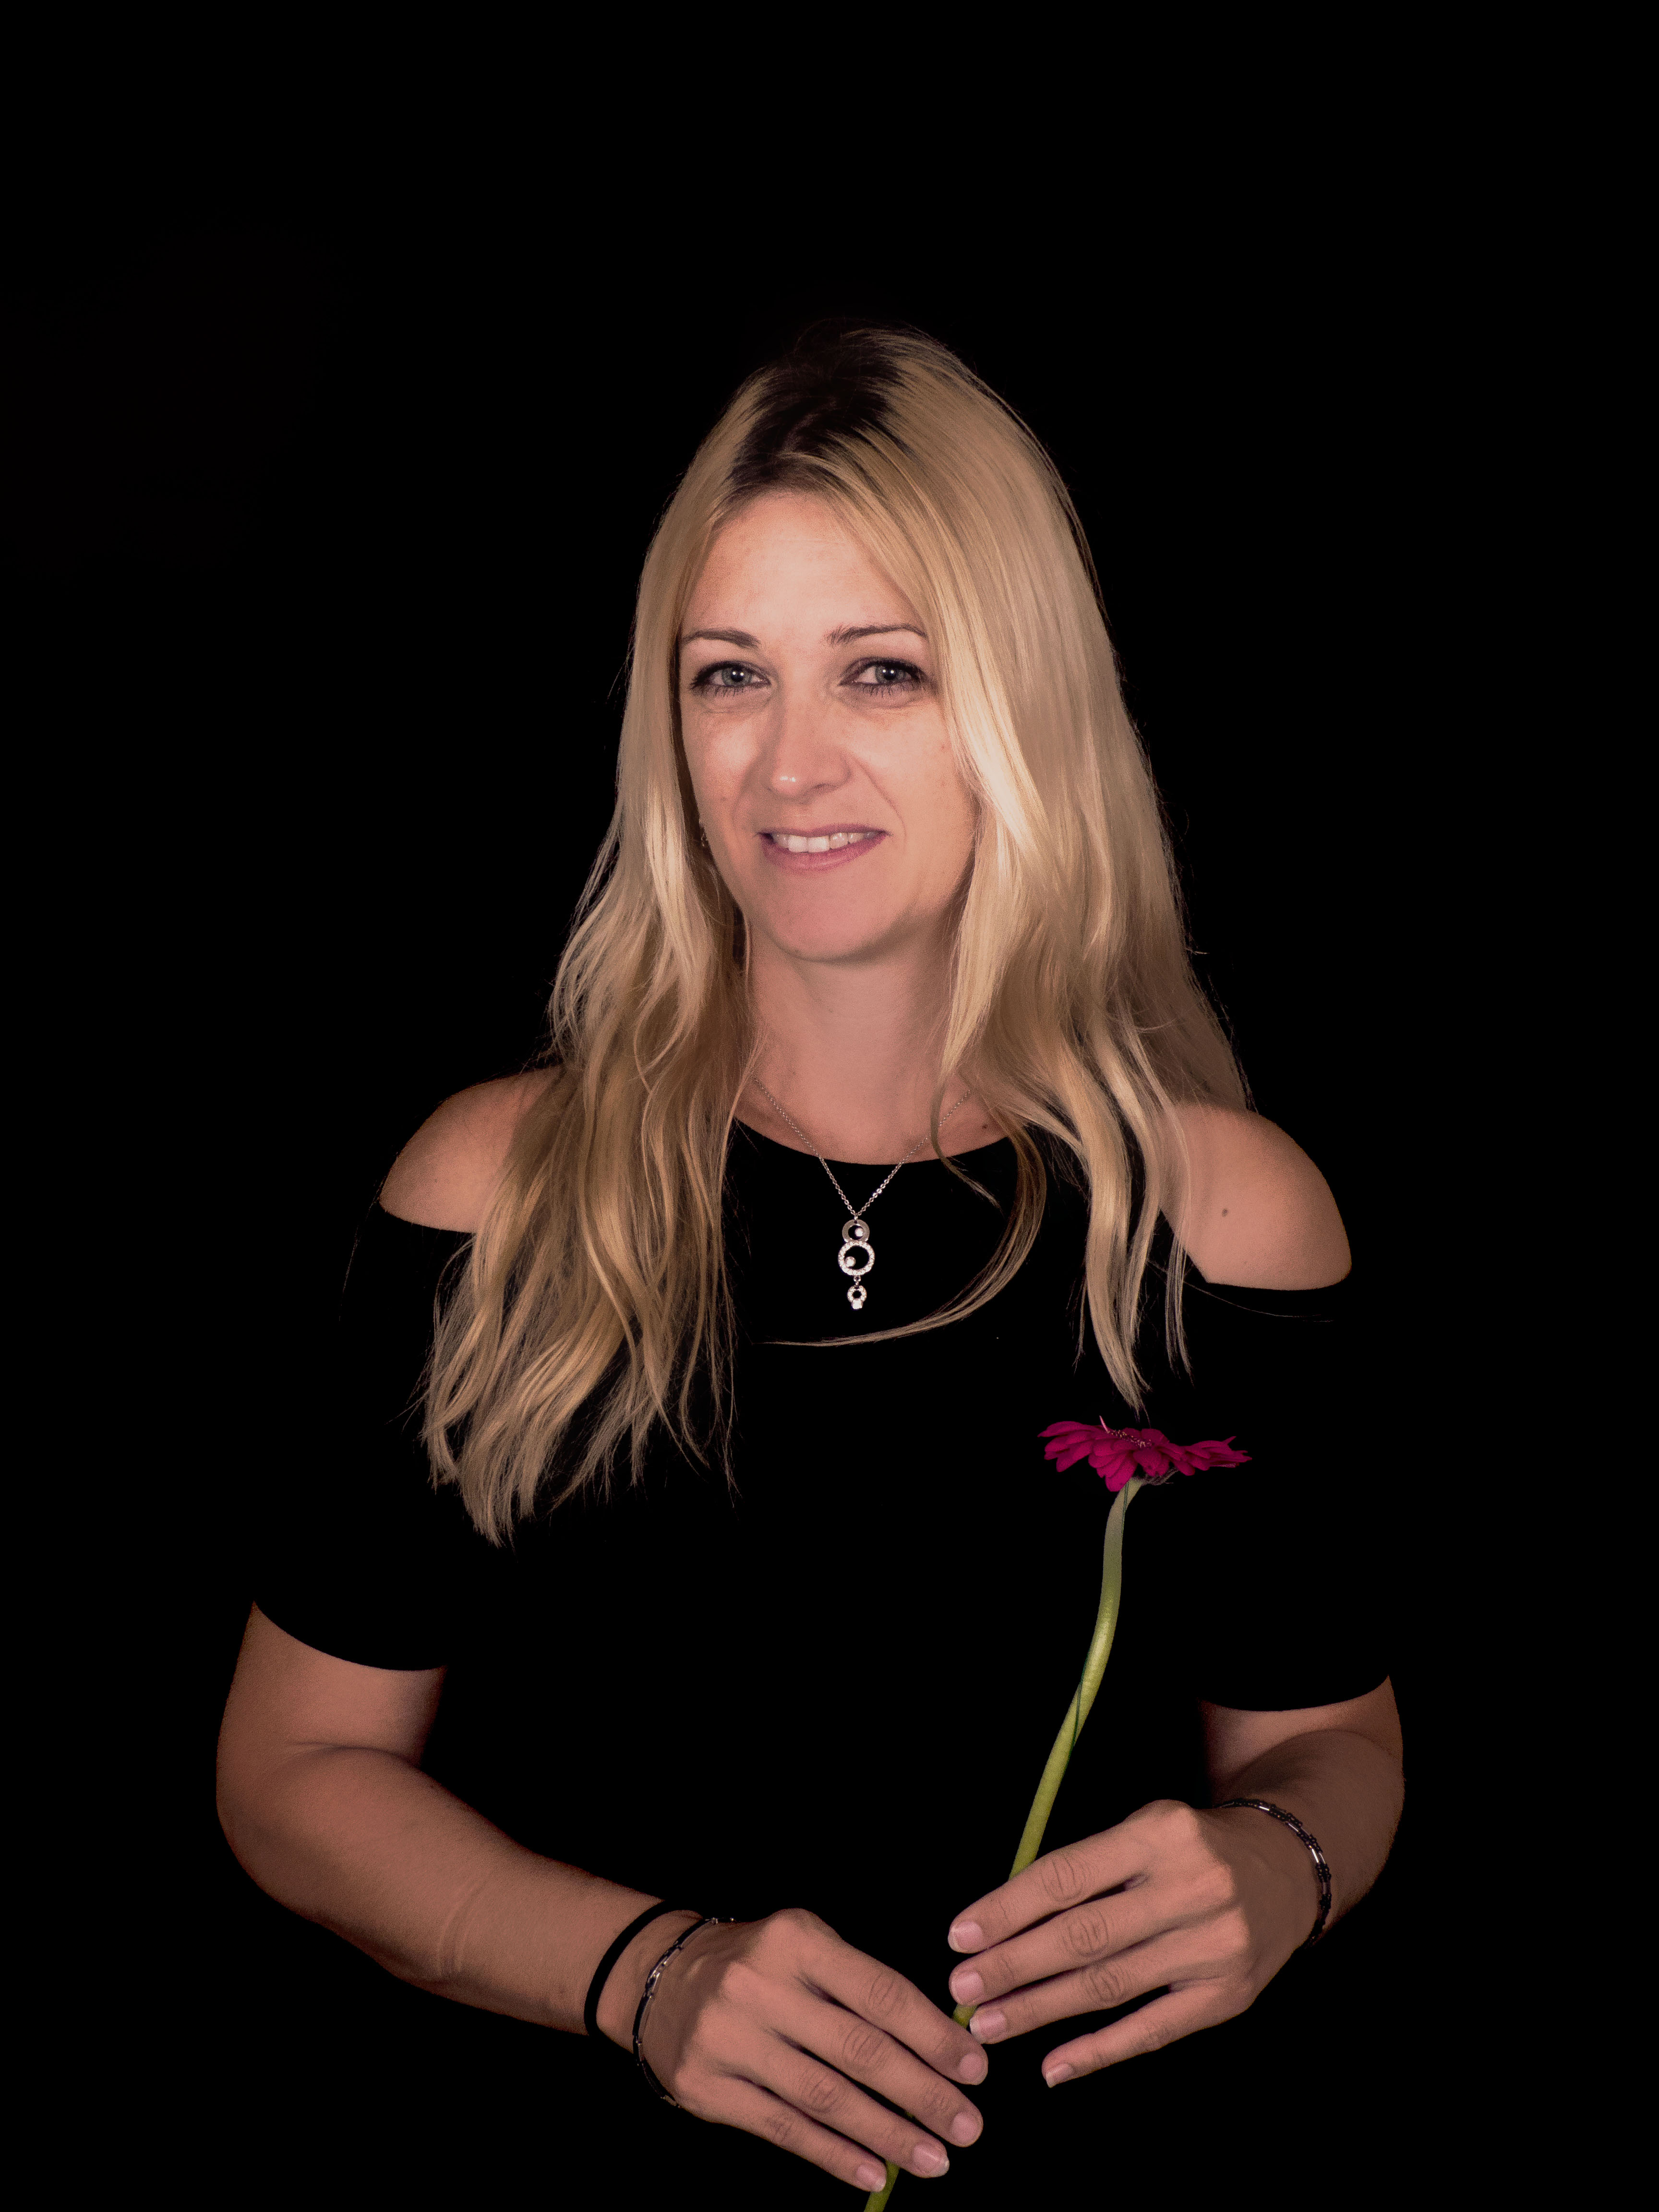 Sabrina Mossegger